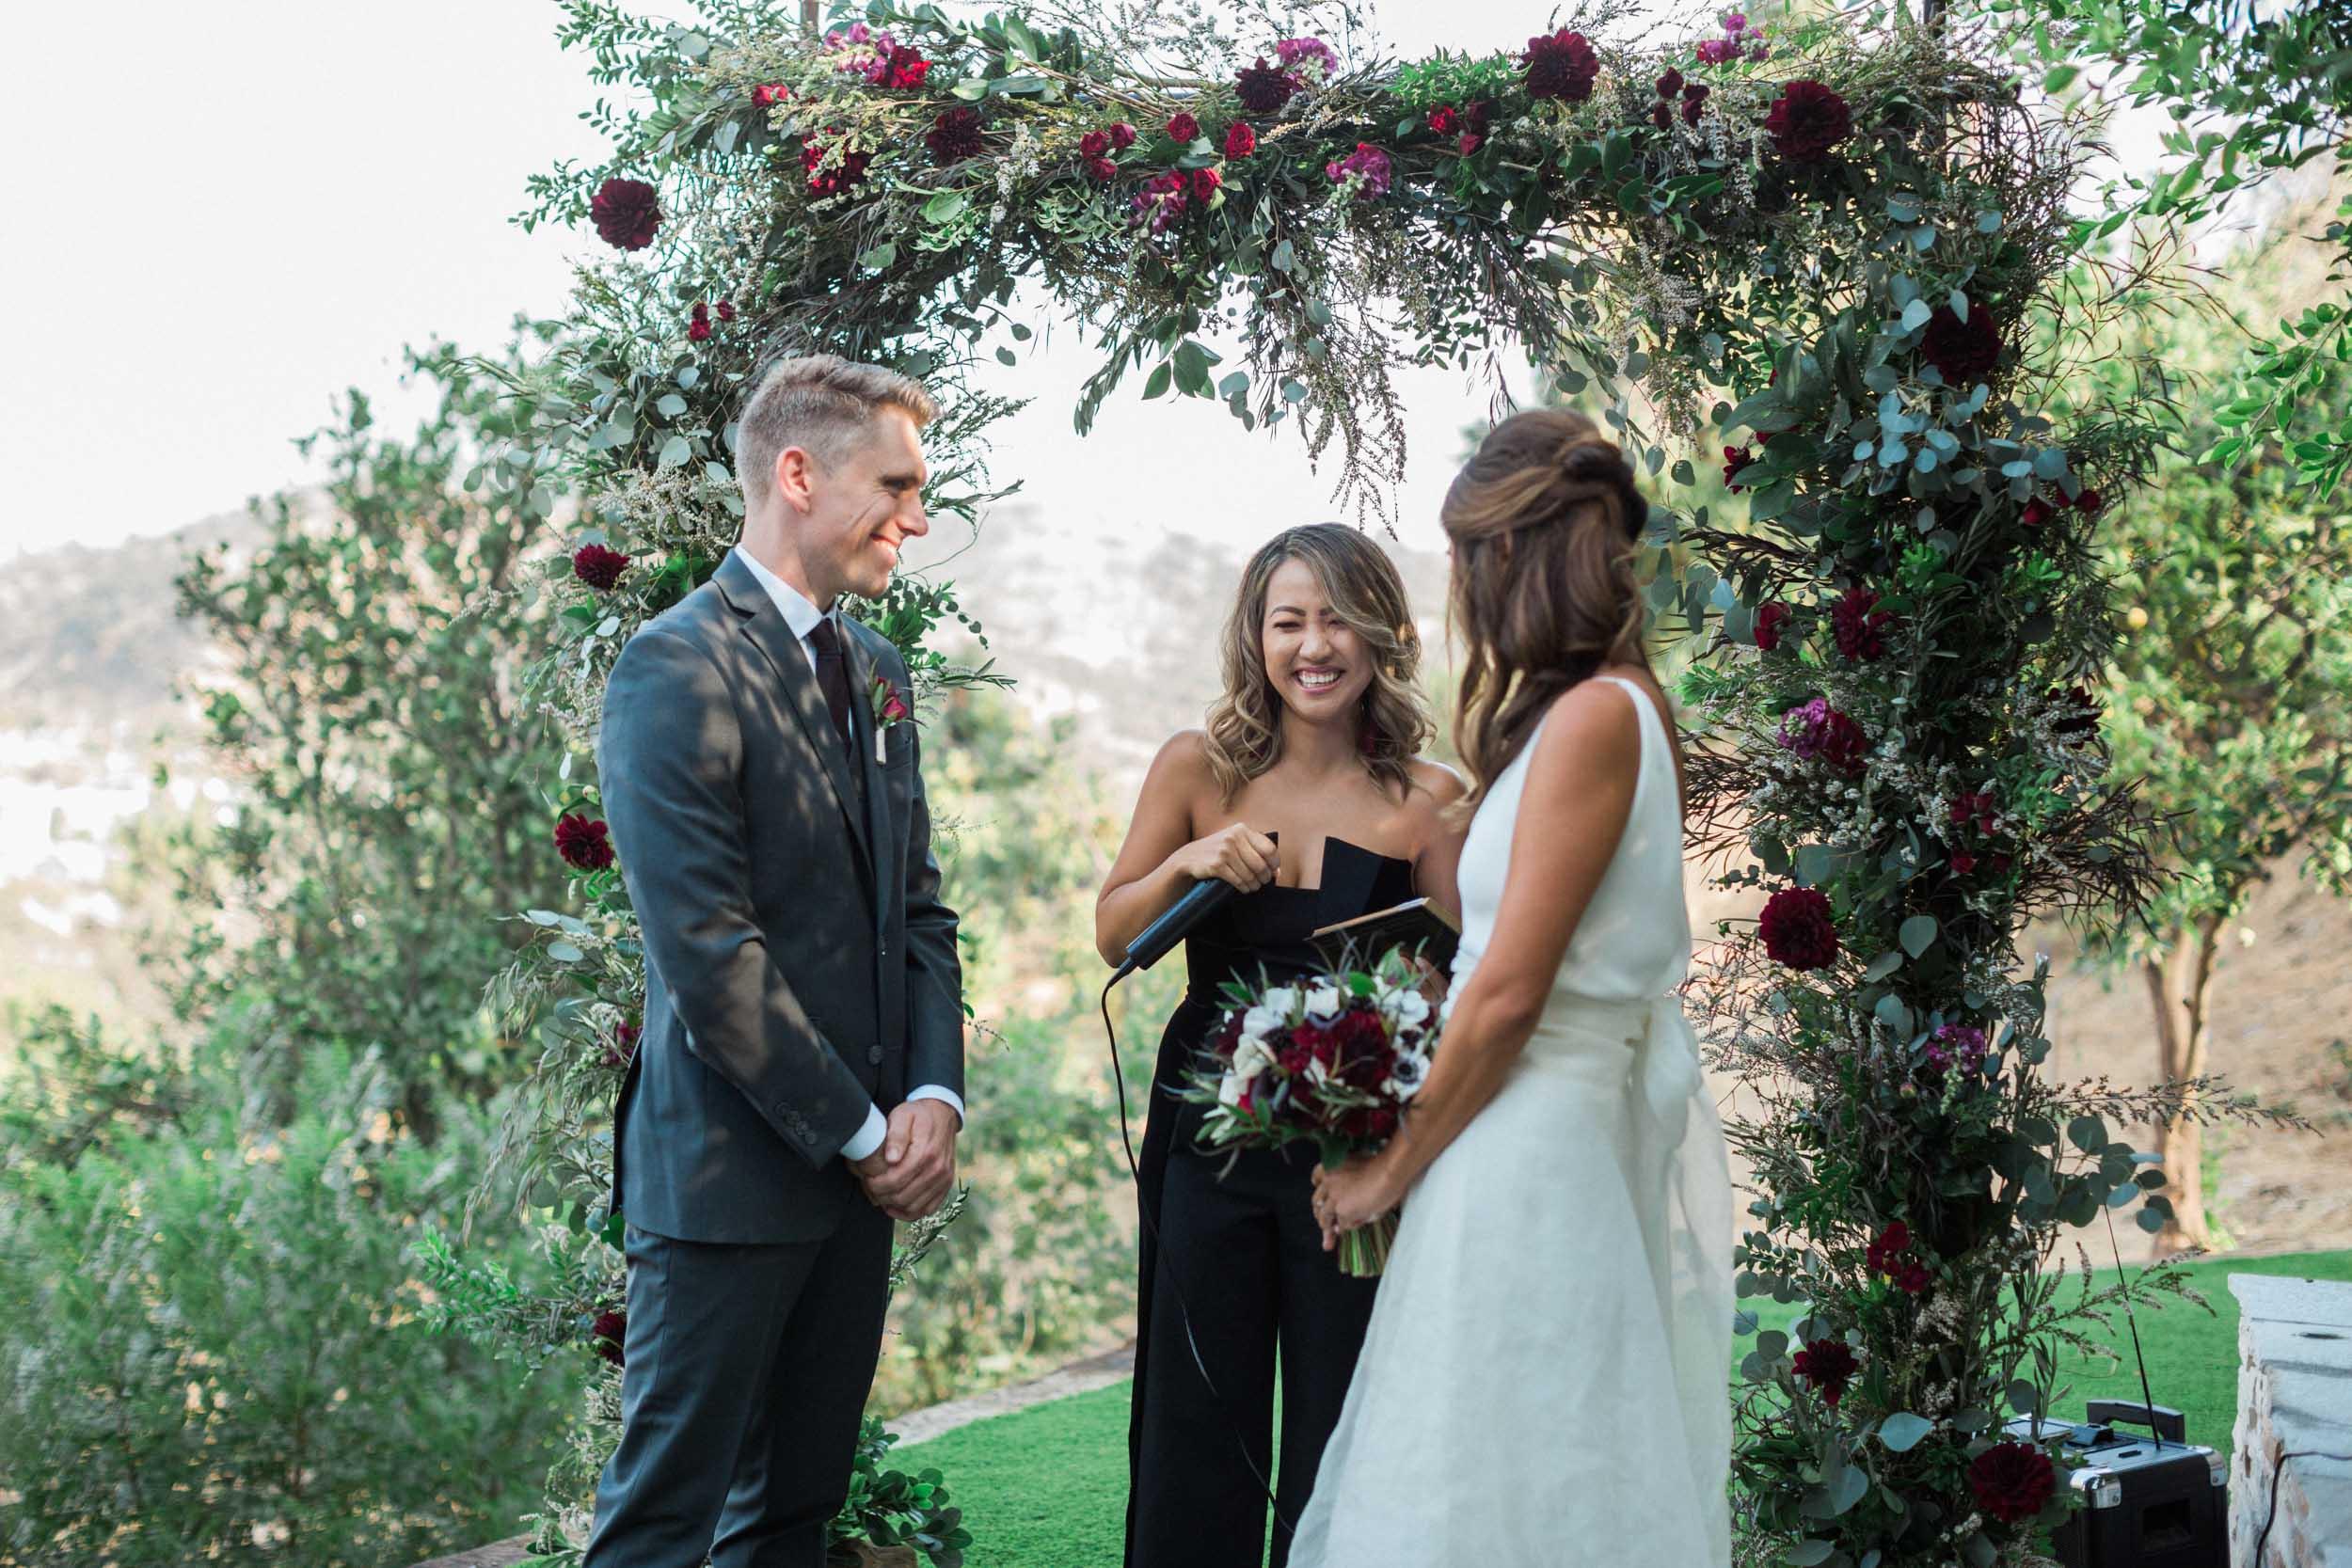 BKM-Photography-Highland-Park-Los-Angeles-Backyard-Wedding-0026.jpg